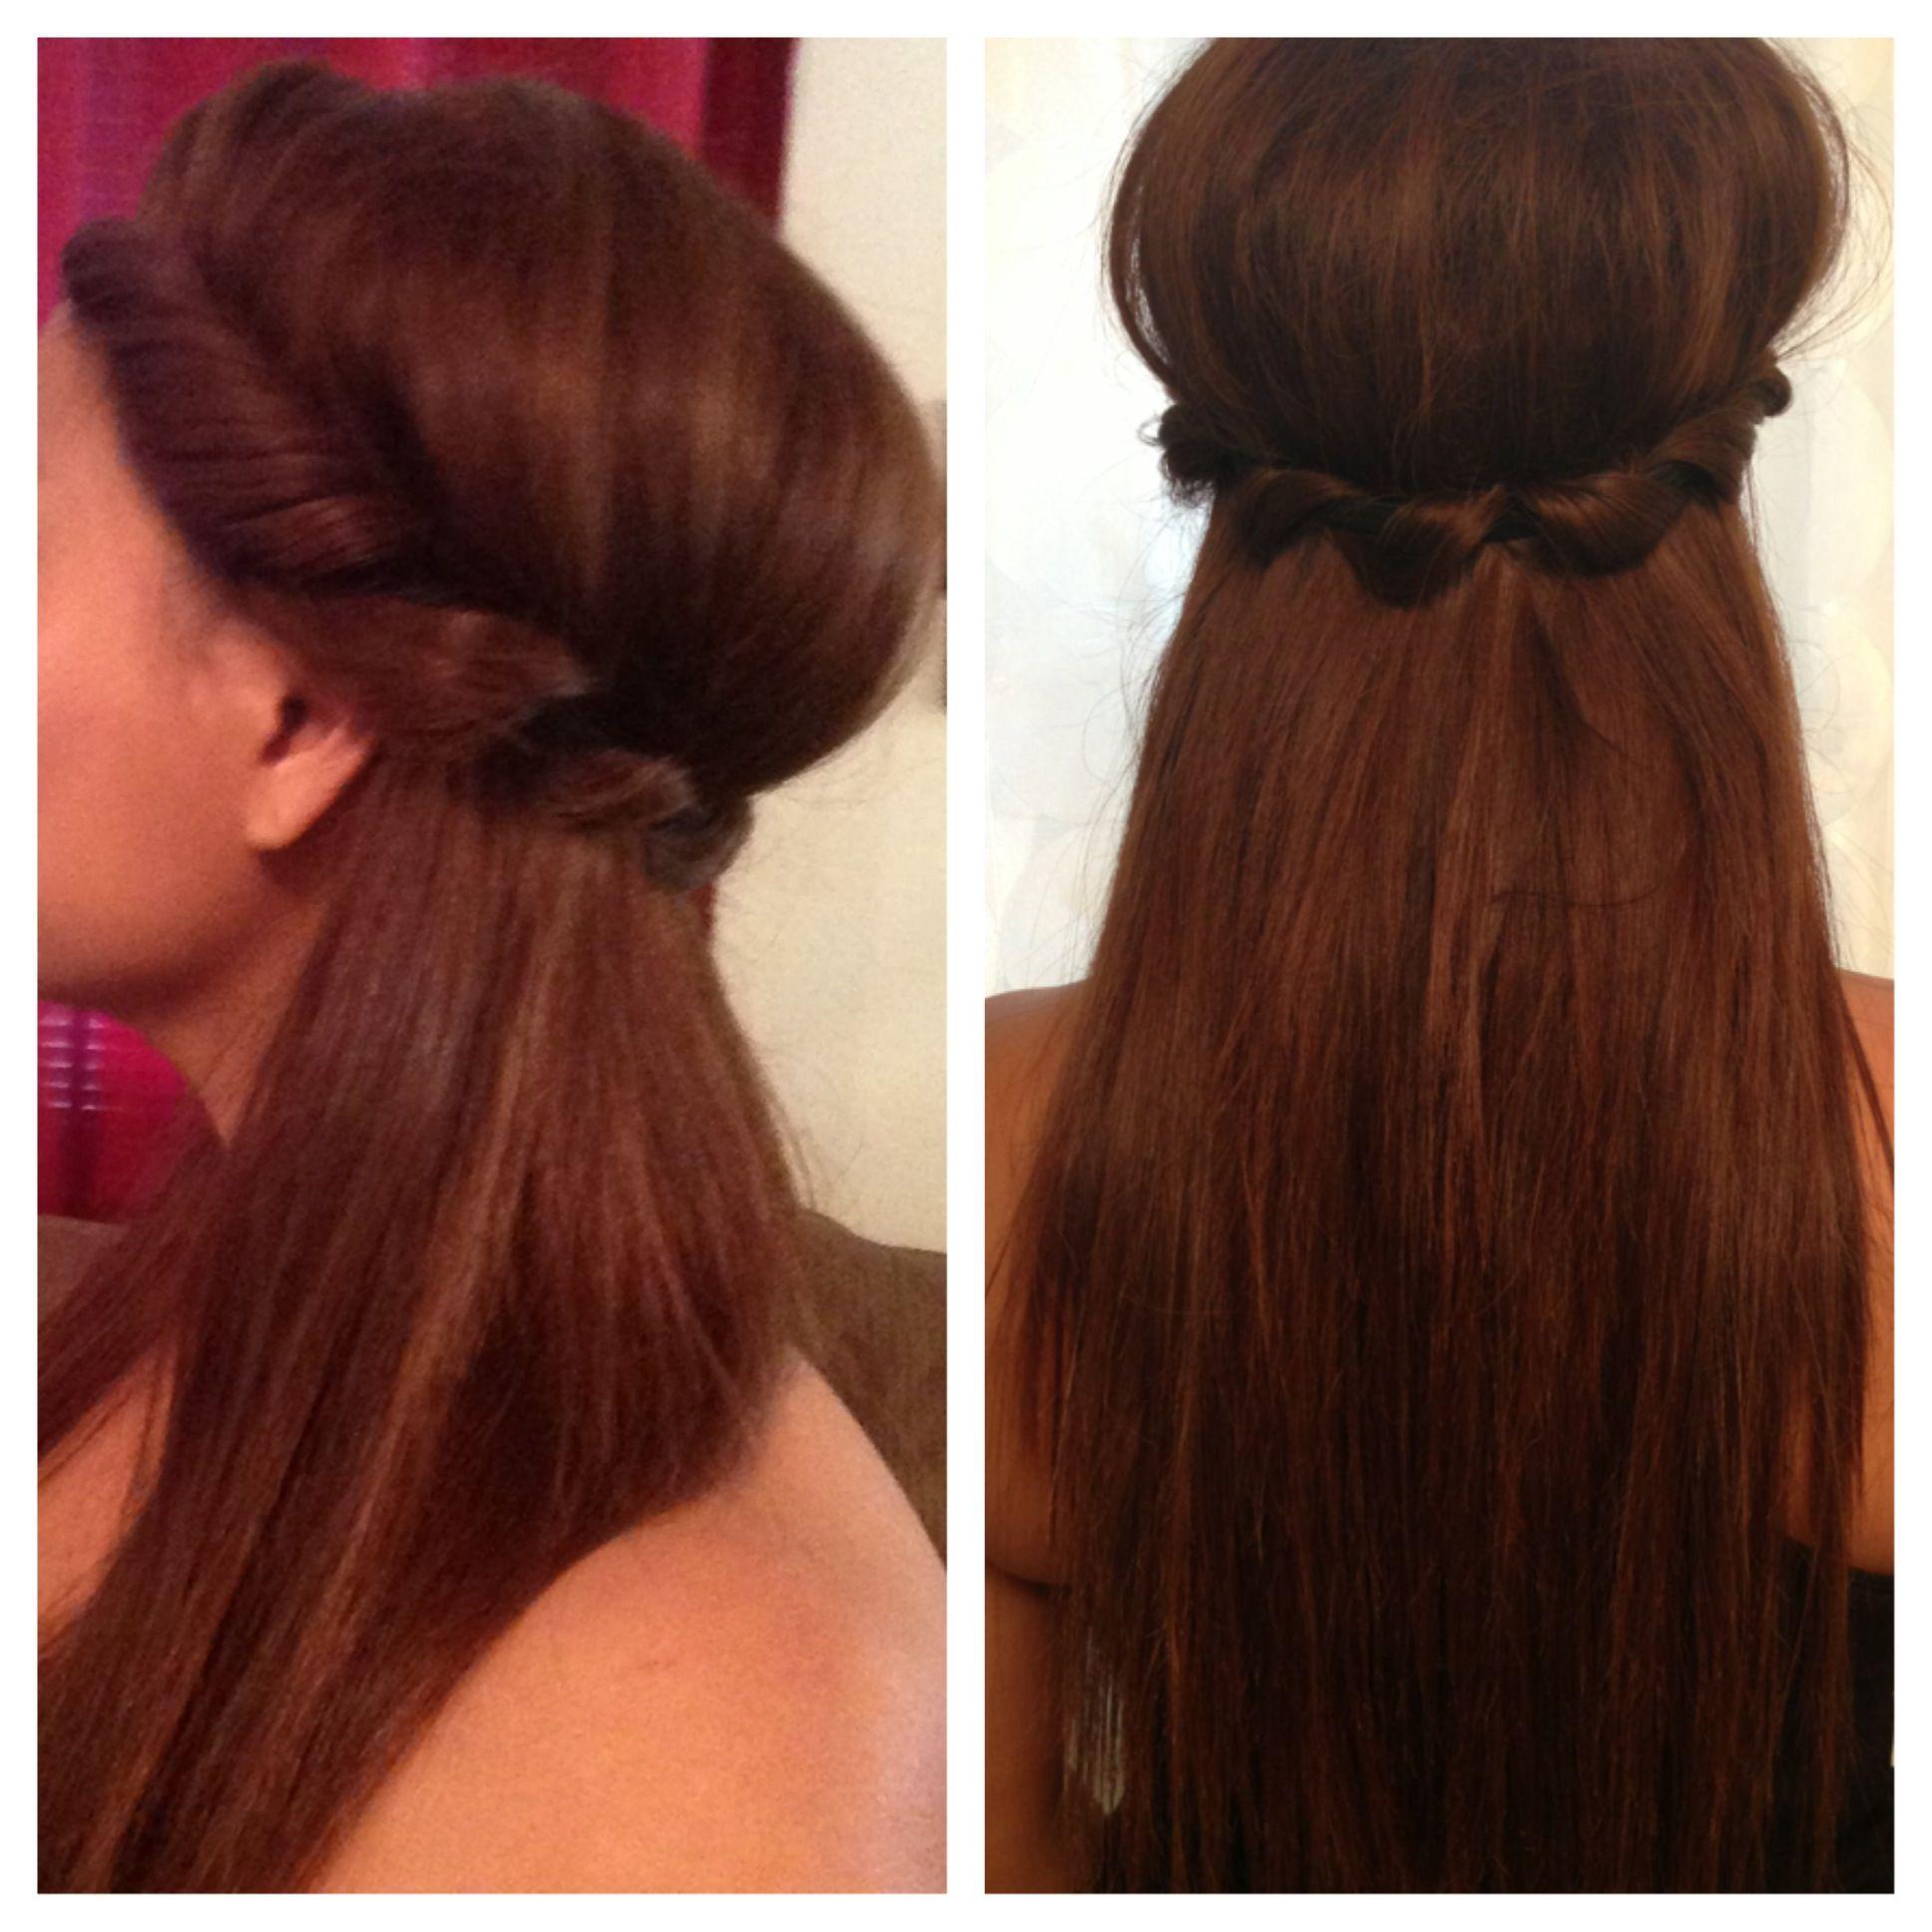 Halfway grecian updo grecian hairstyles pinterest halfway grecian updo pmusecretfo Image collections